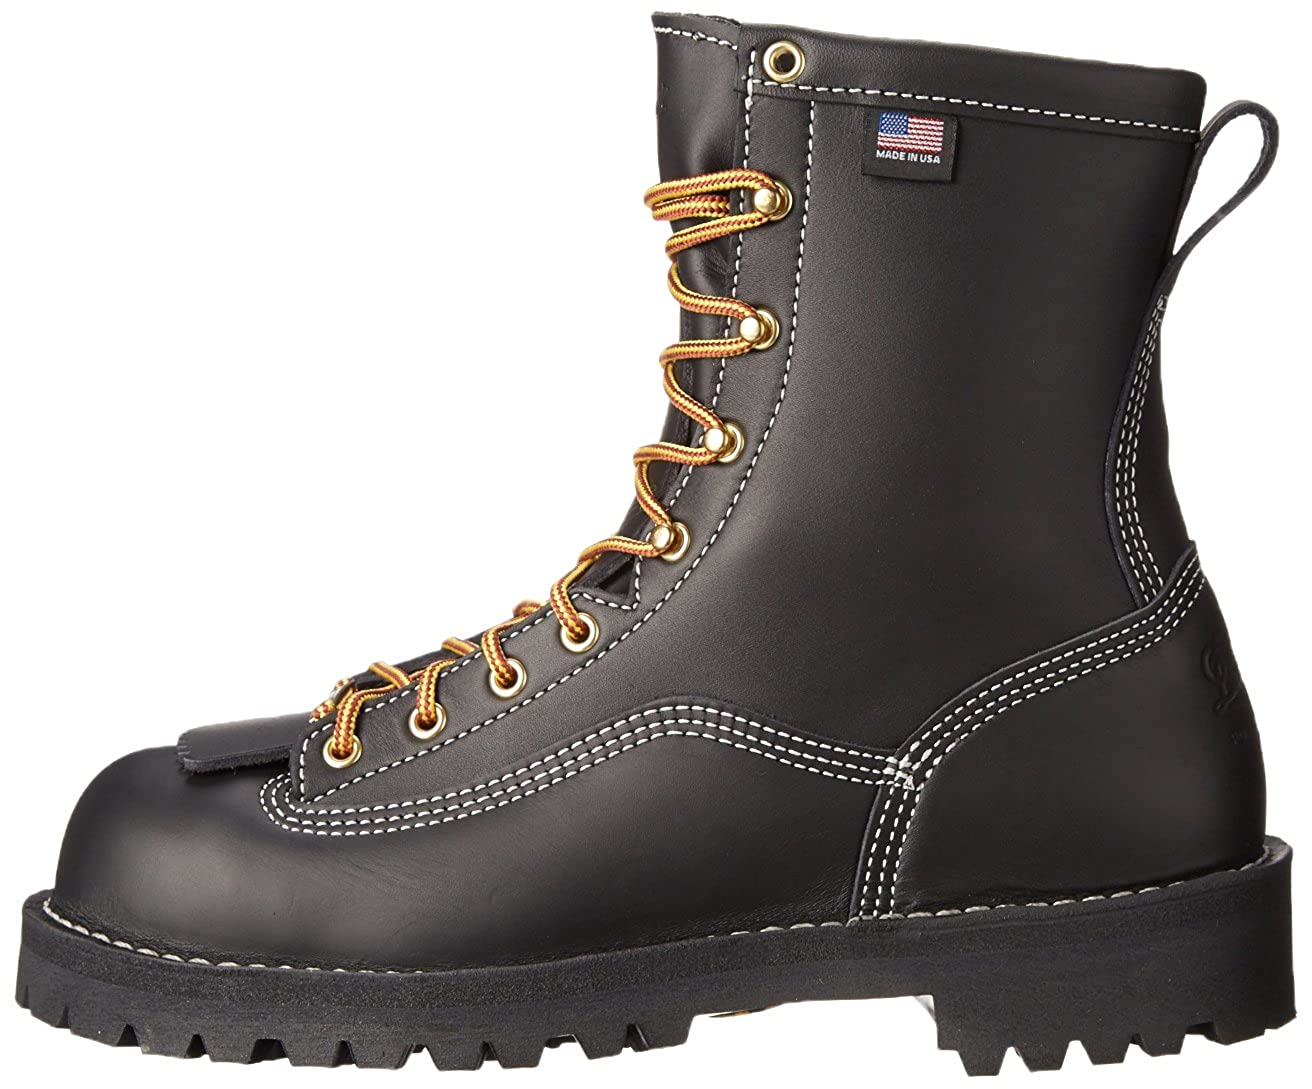 fa9ded7ac39 Danner Men's Super Rain Forest 8 Inch Work Boot